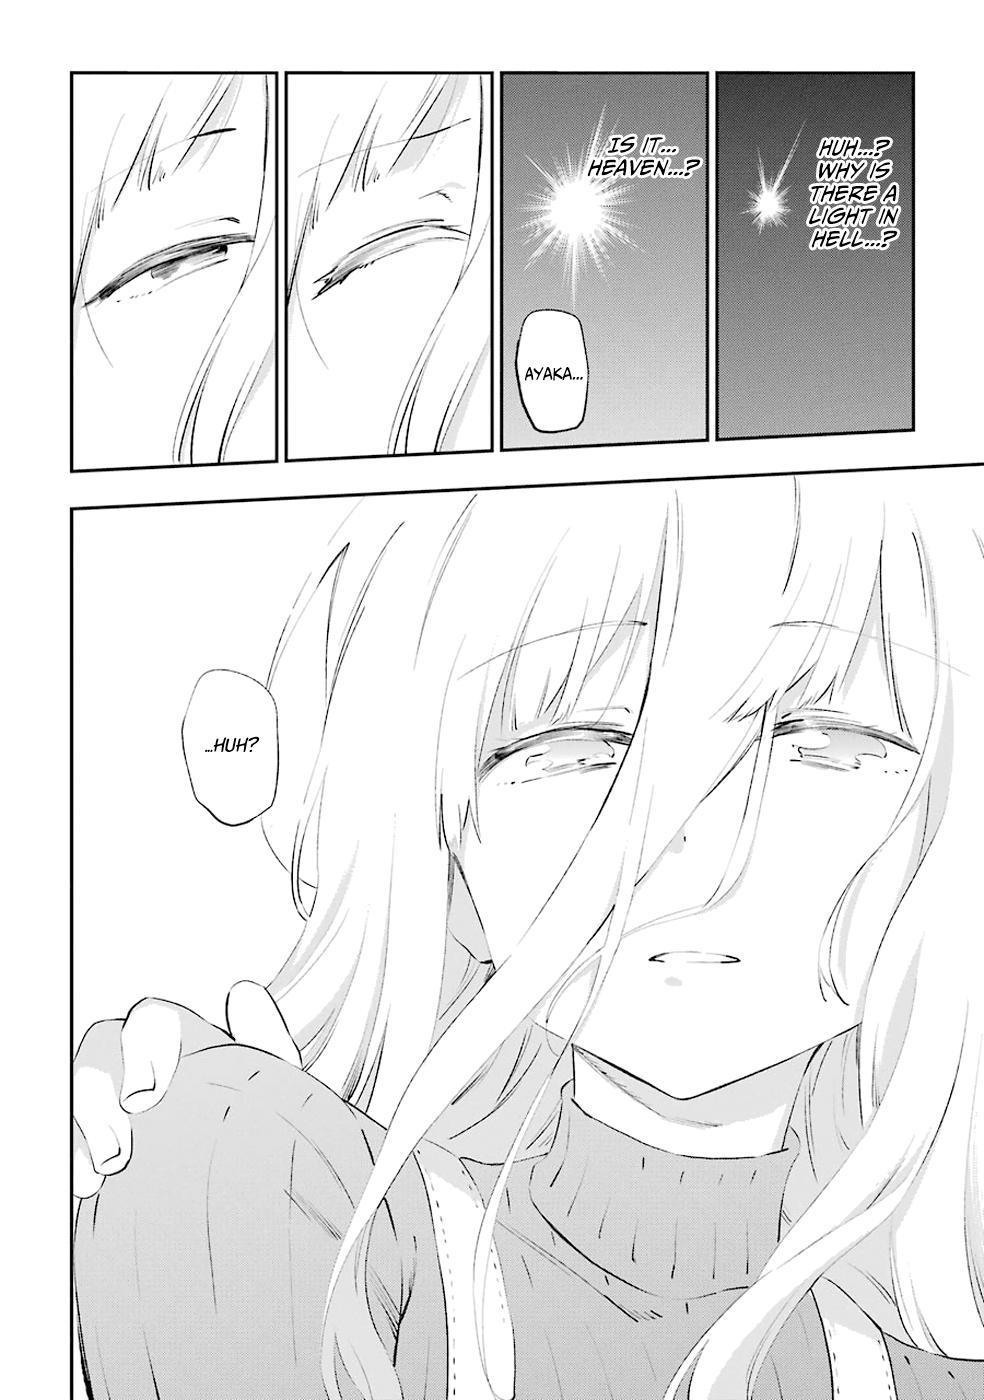 Urami Koi, Koi, Urami Koi. - Chapter 37